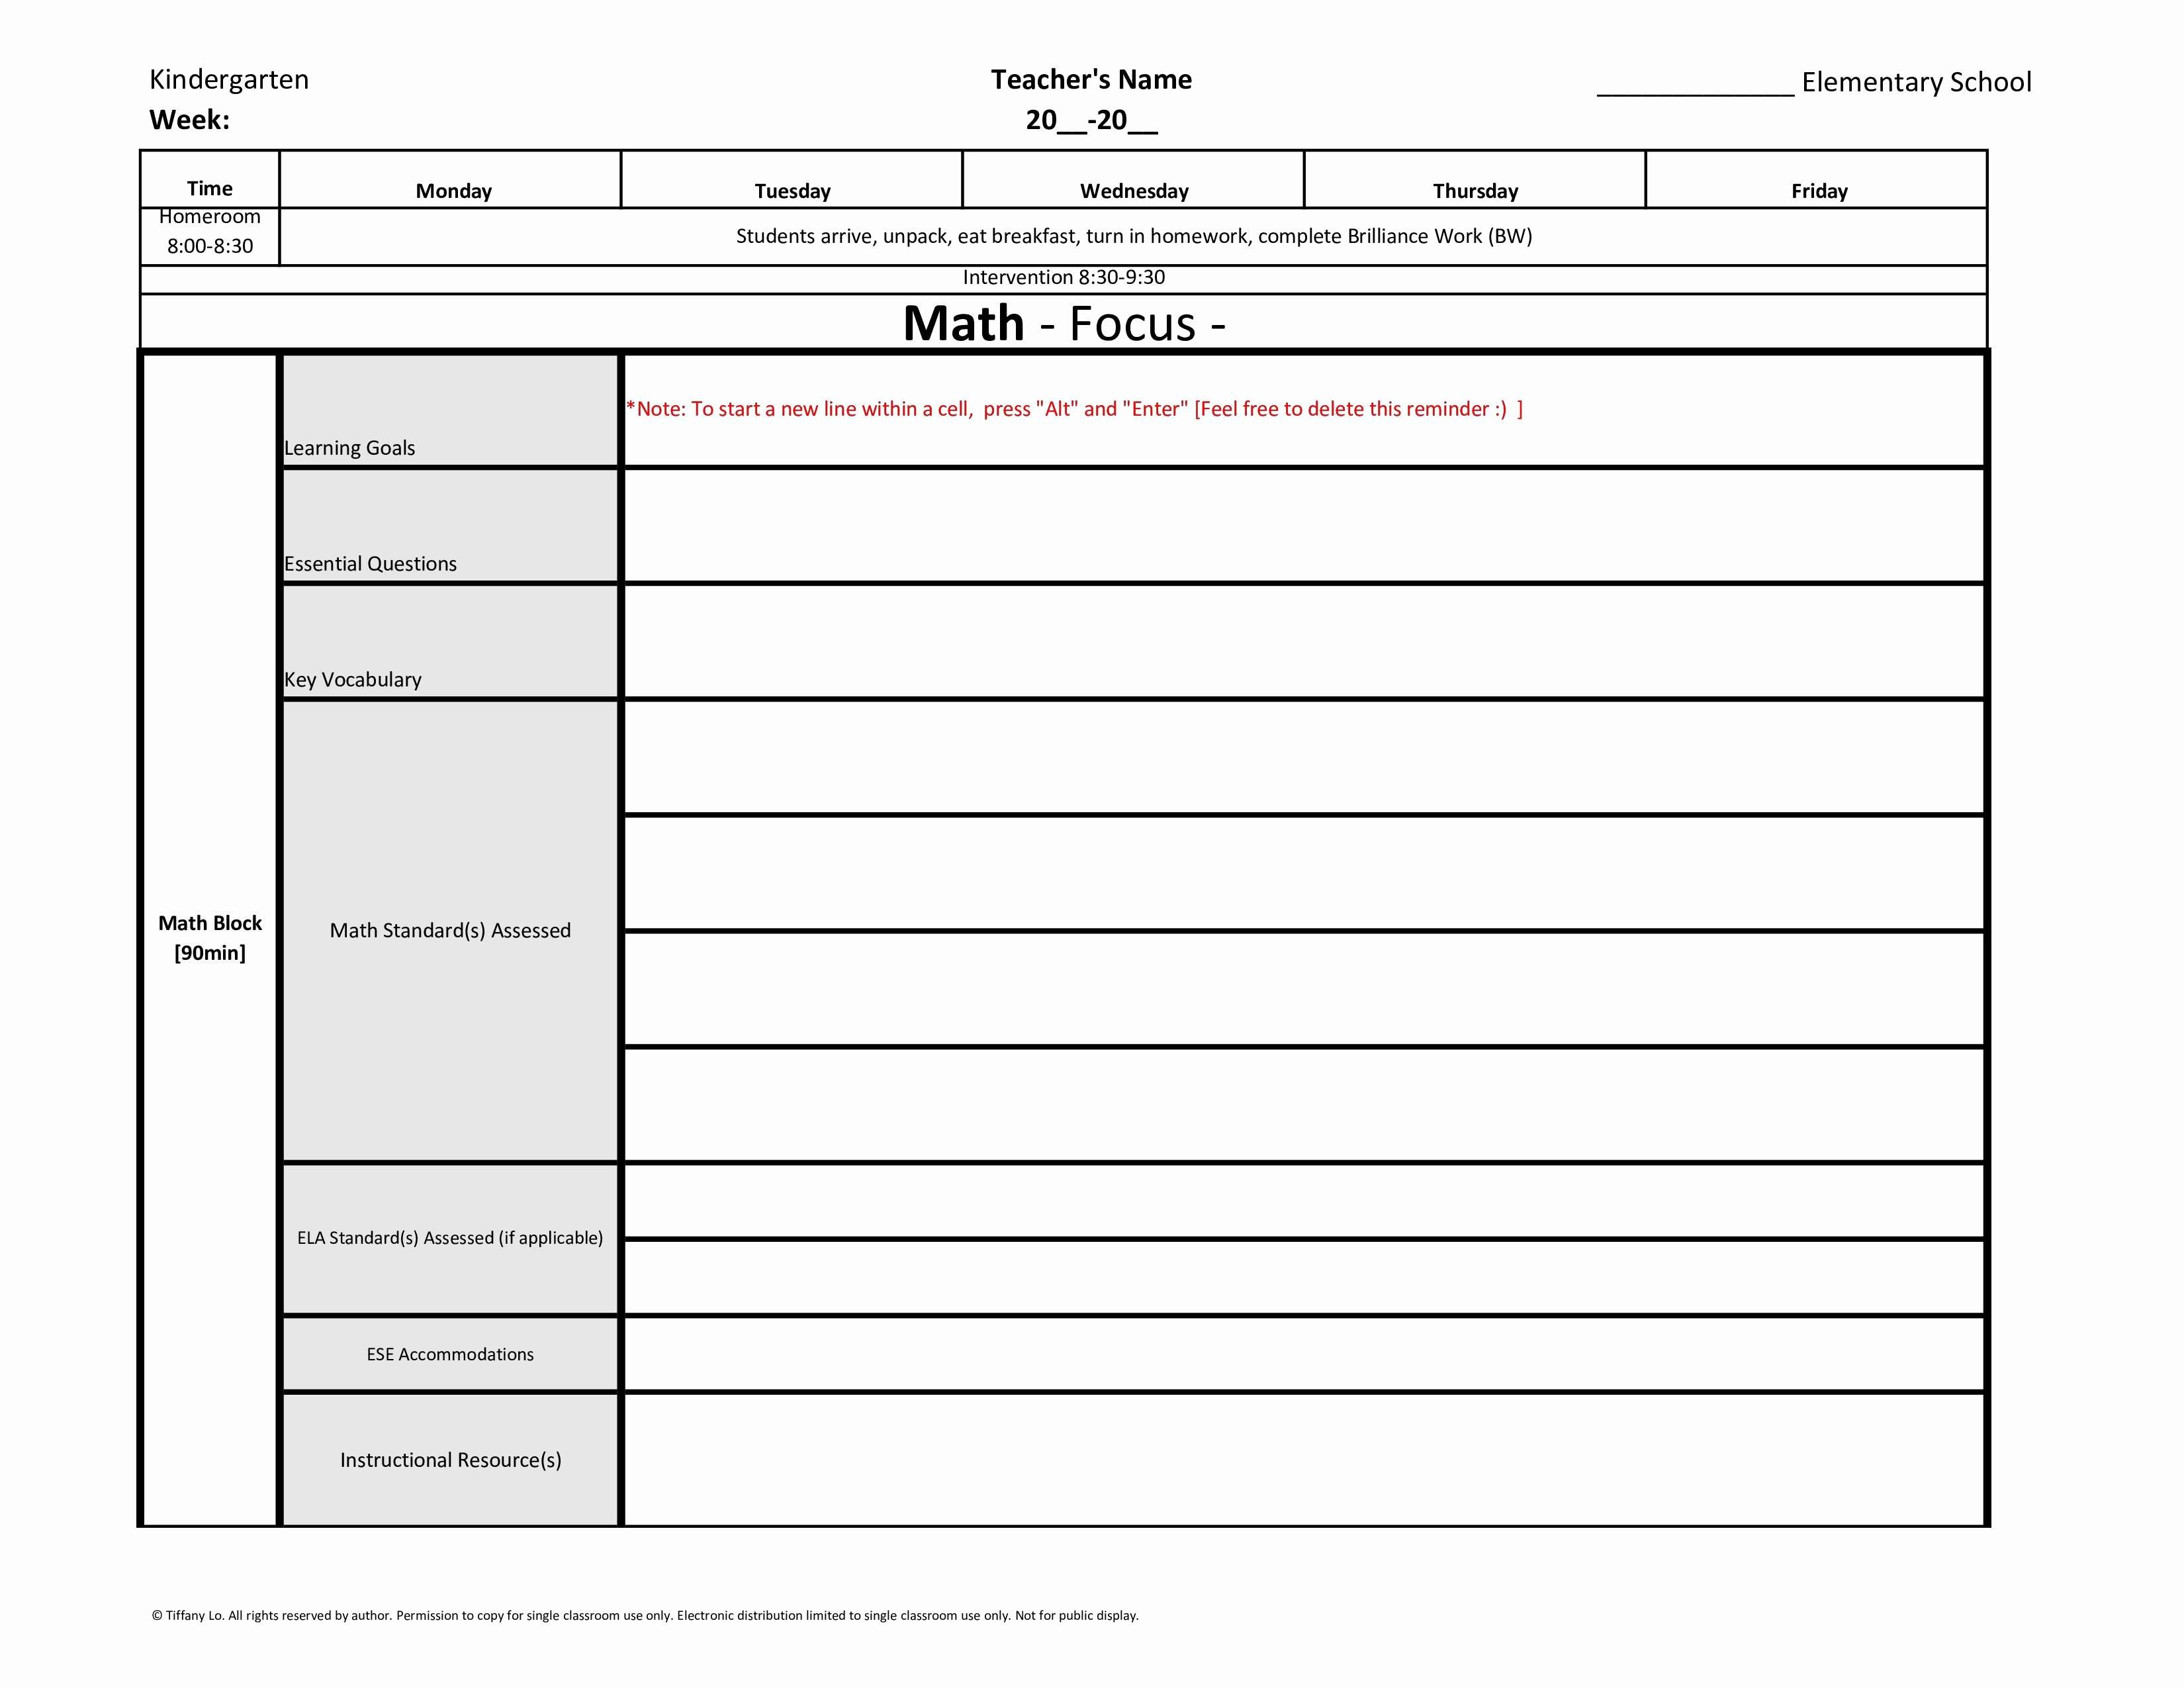 Weekly Lesson Plan Template Elementary Elegant Kindergarten Weekly Lesson Plan Template W Florida